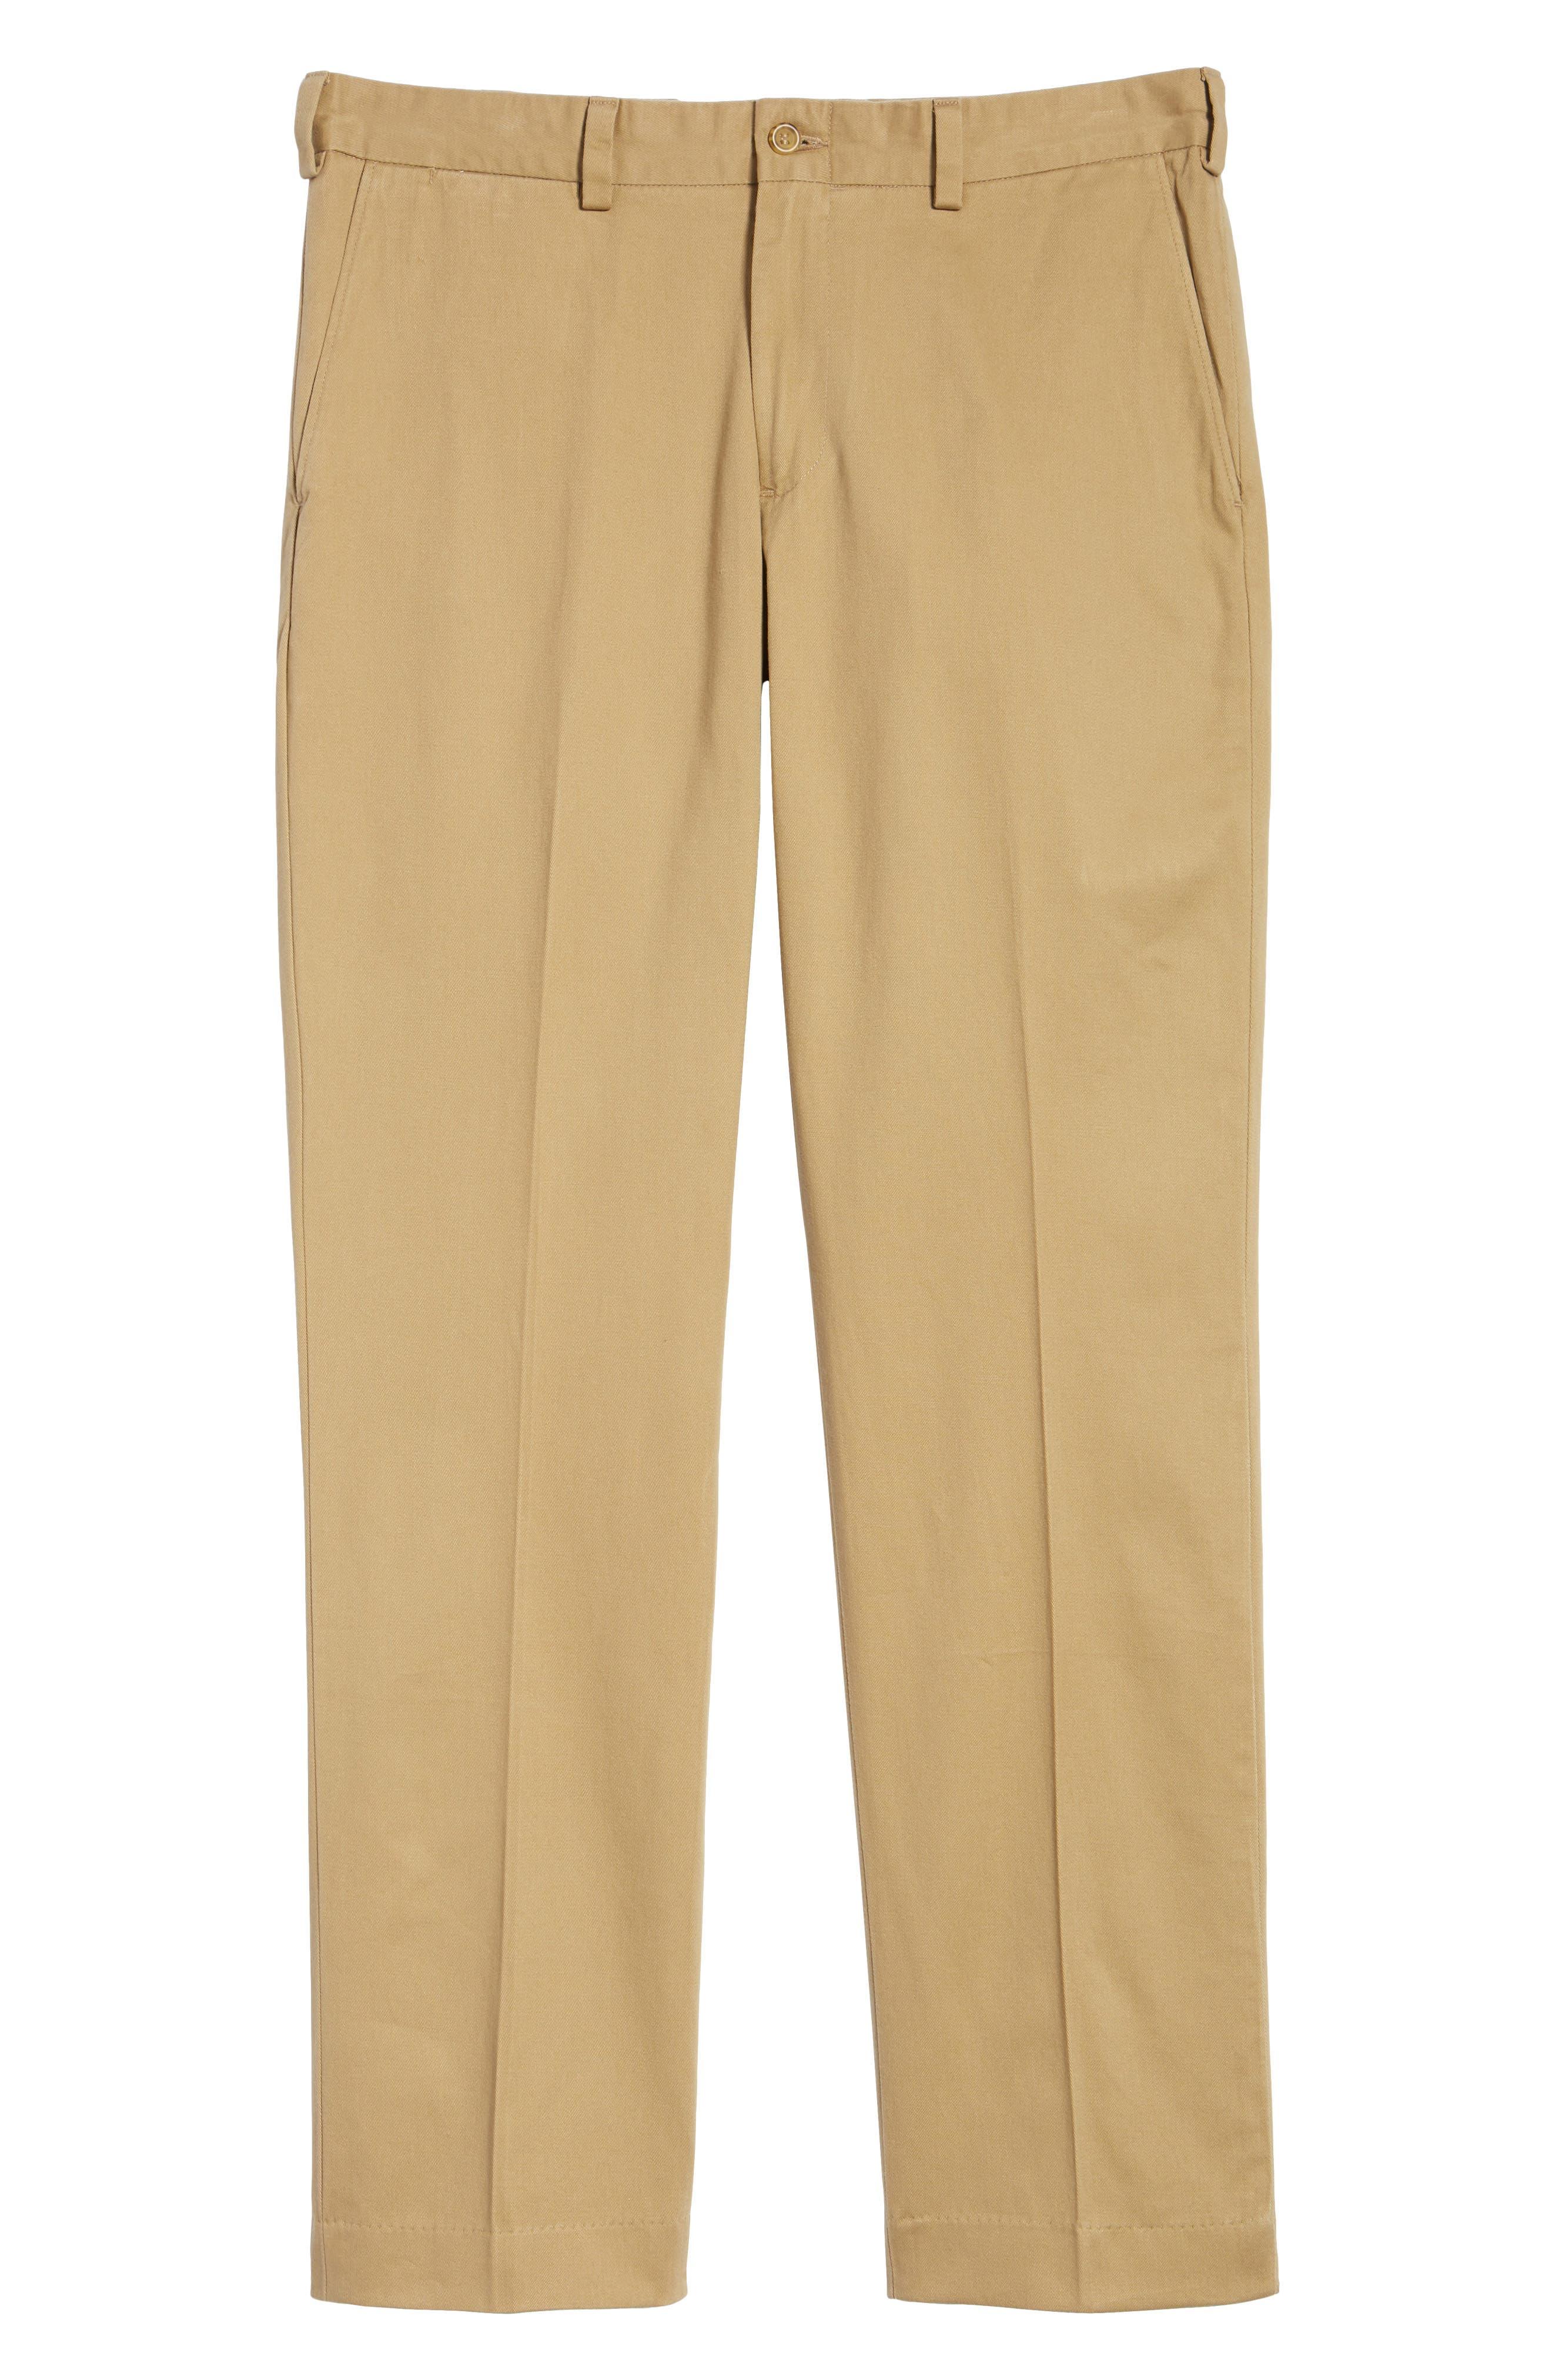 M3 Straight Fit Vintage Twill Flat Front Pants,                             Alternate thumbnail 6, color,                             British Khaki